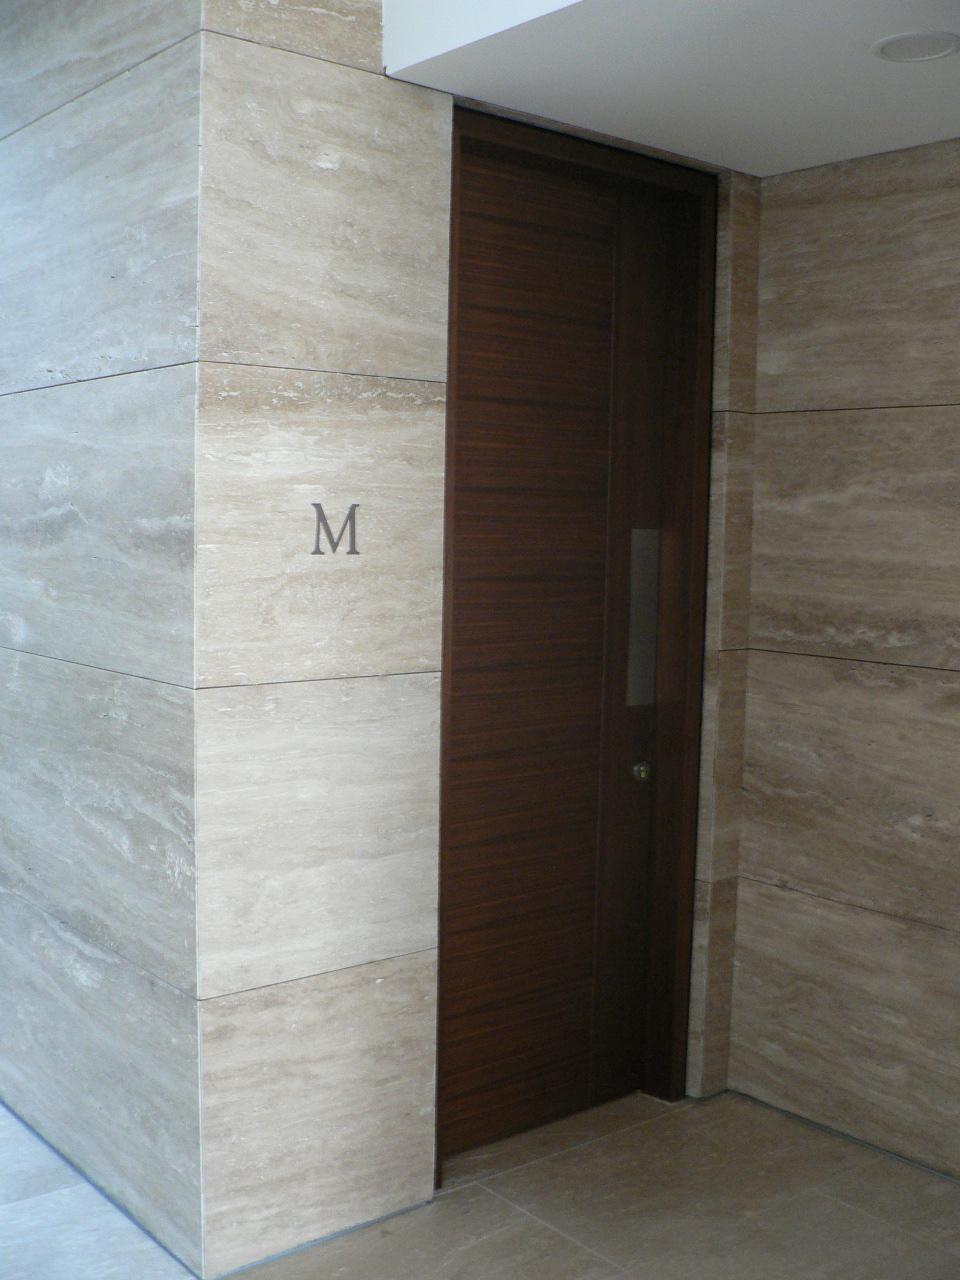 whwWeb_Serai_Toilet_Male (1100606).jpg